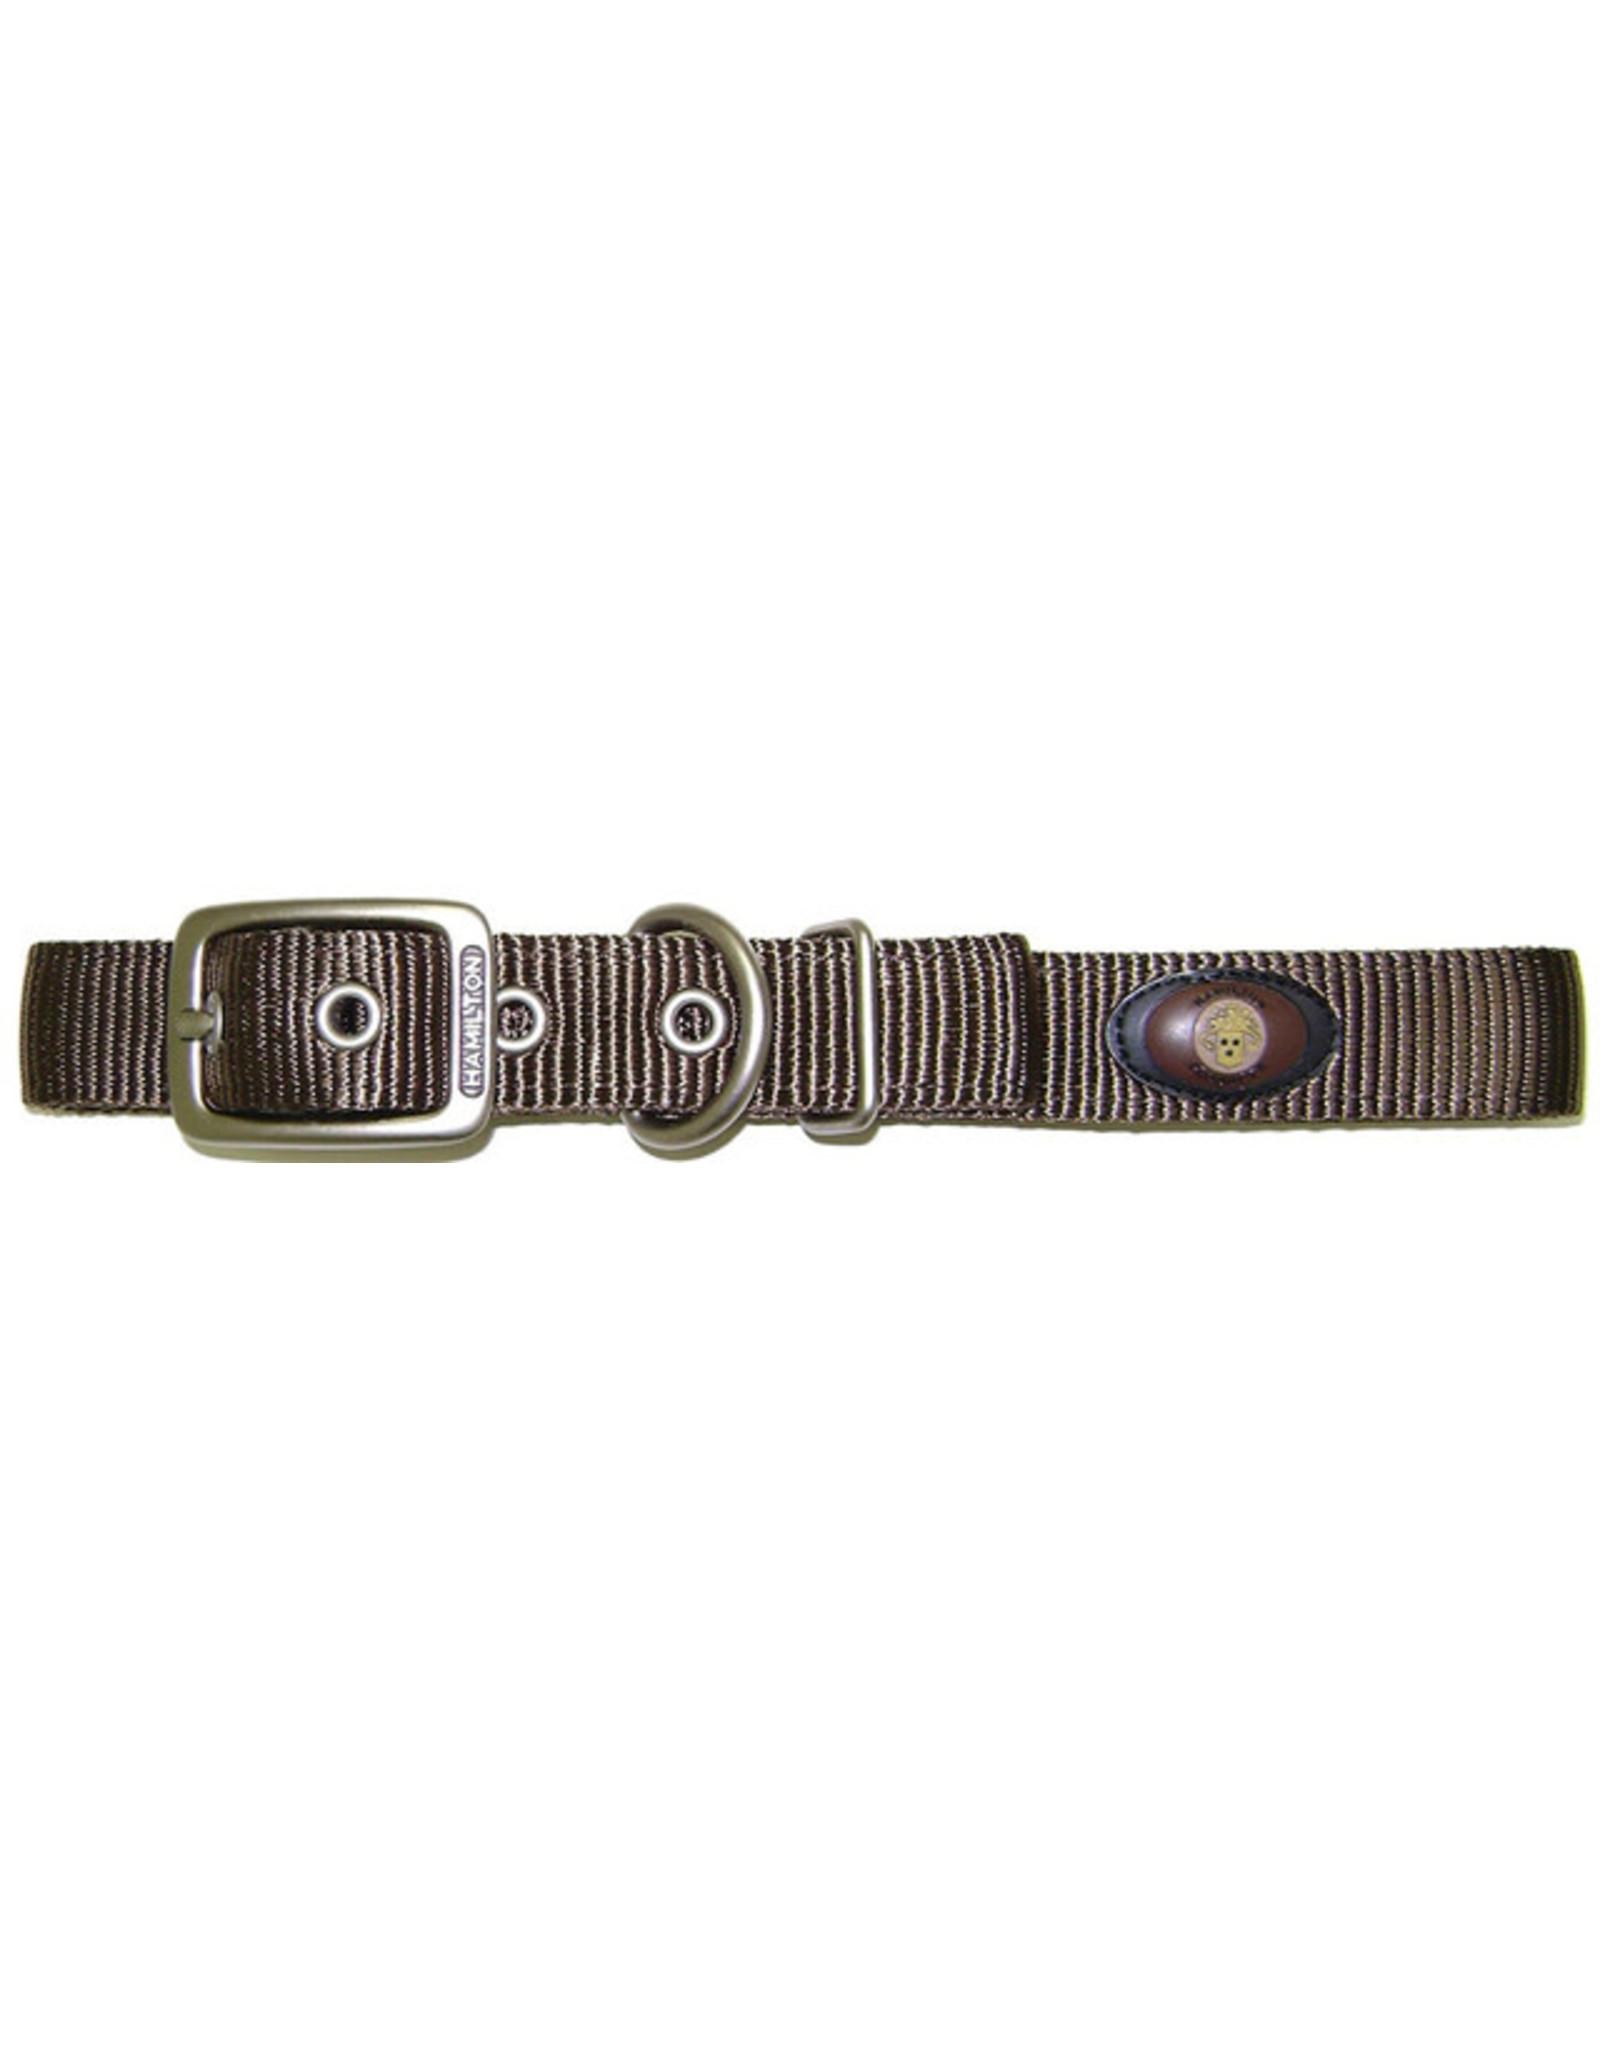 Hamilton Hamilton Sherbet Series Double Nylon Collar